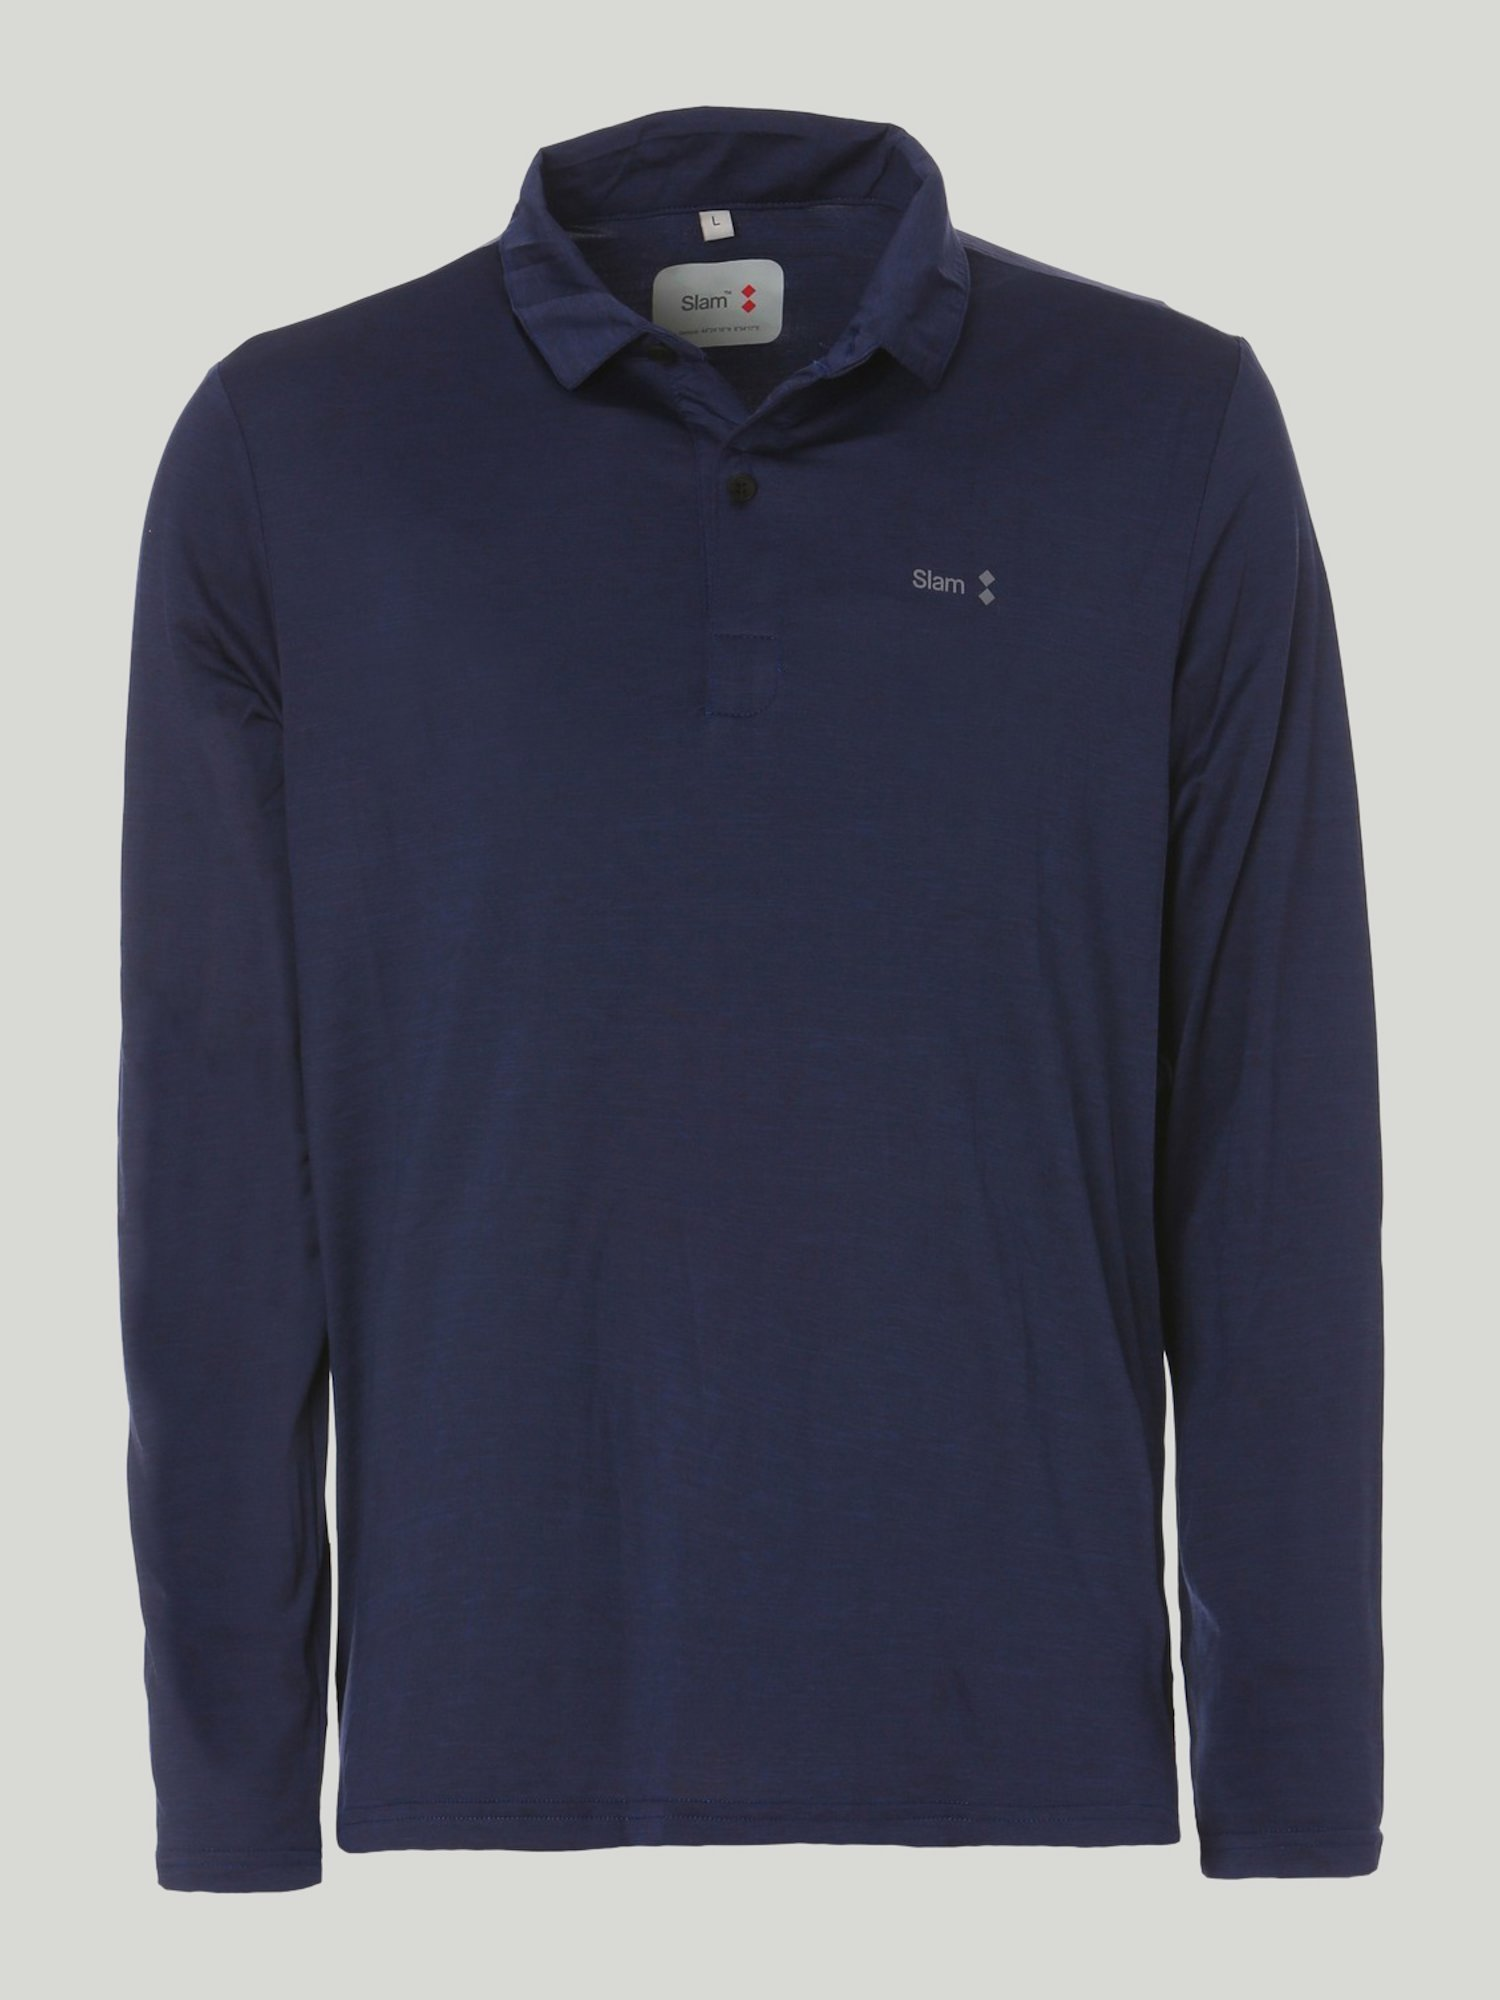 Poloshirt Maiao - Navy Blau